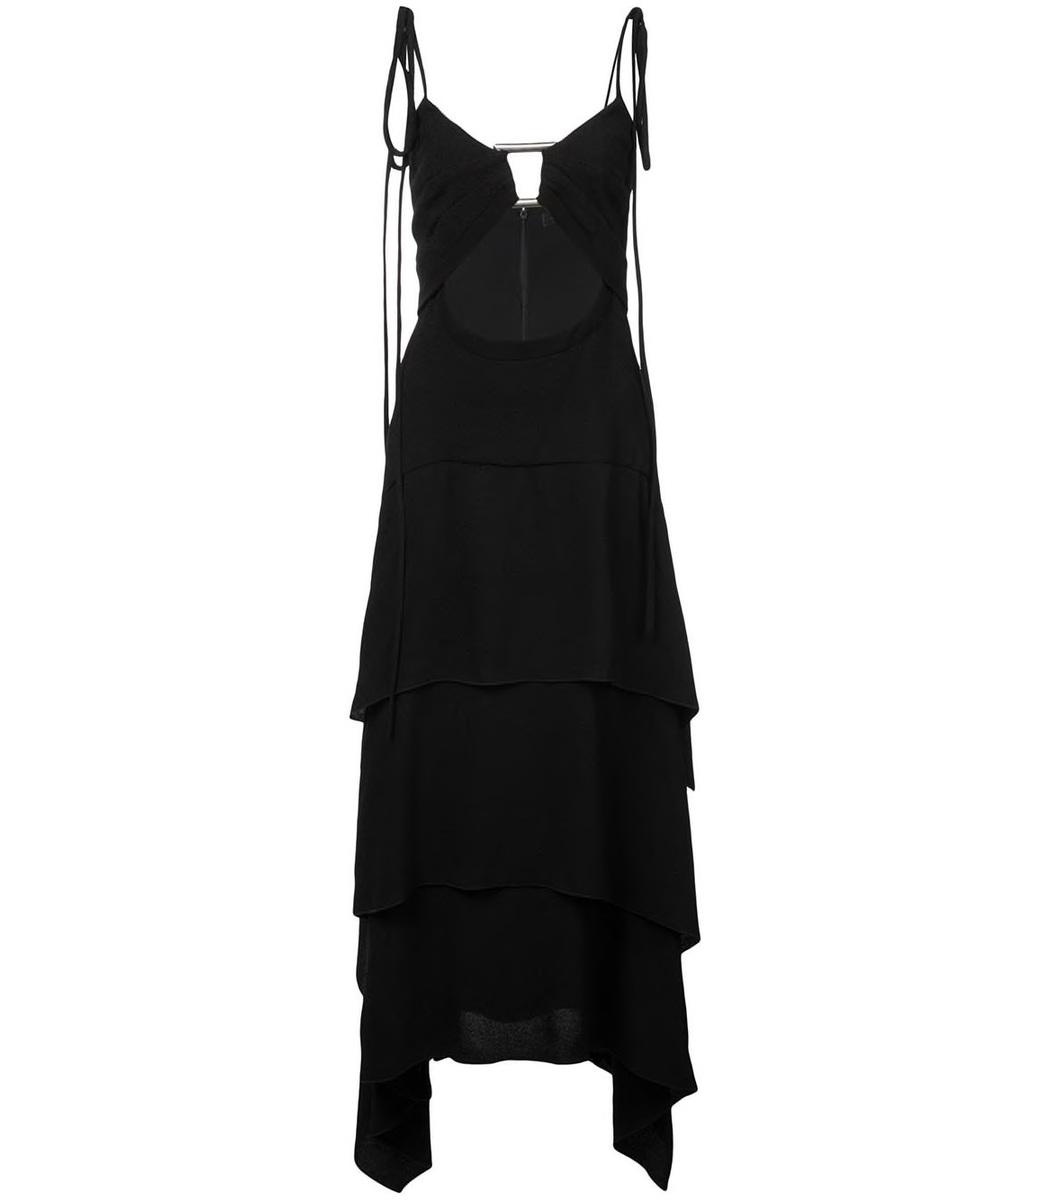 Proenza Schouler Black Layered Midi Dress